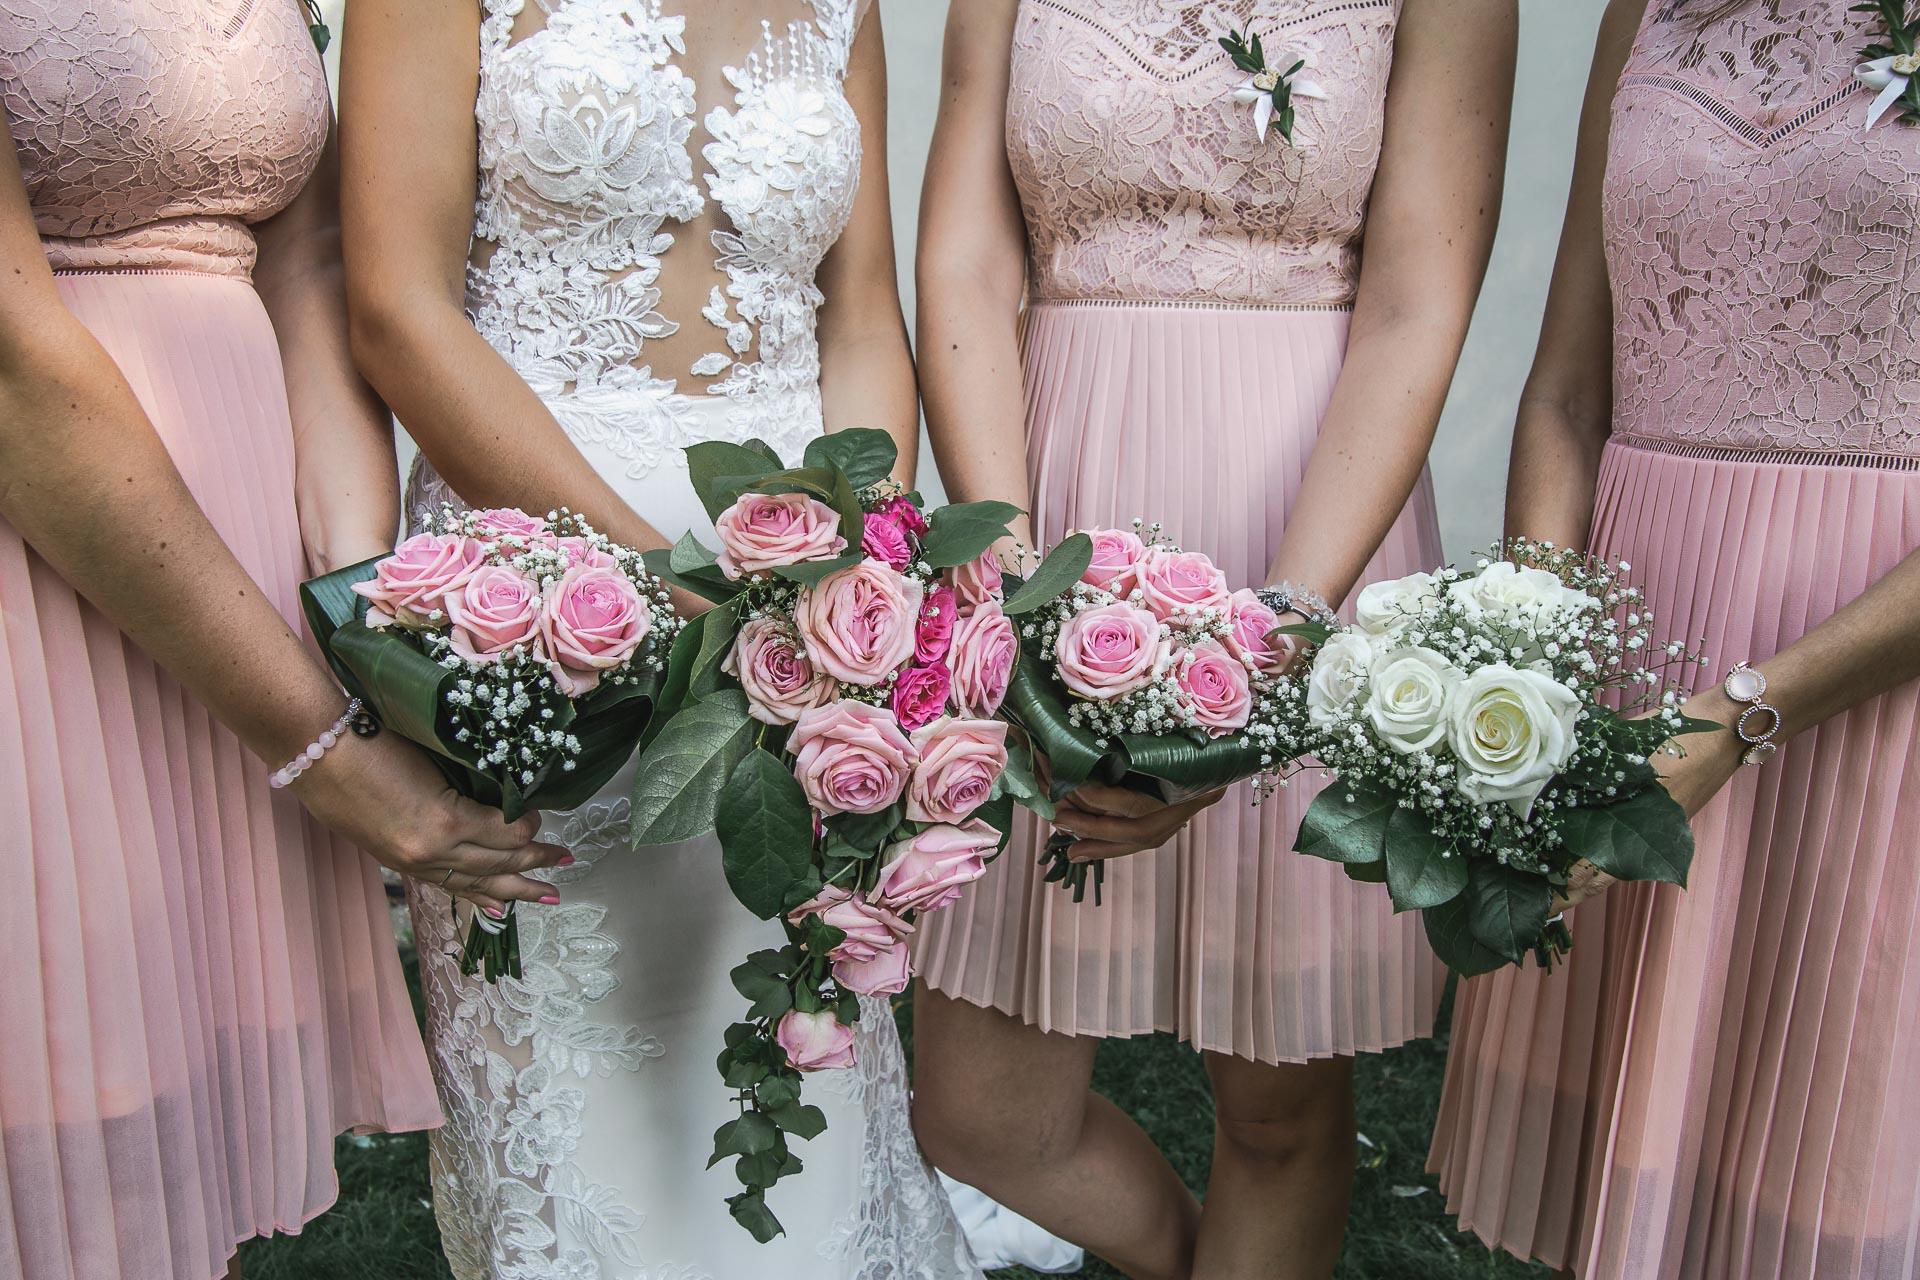 svatební-fotograf-wedding-svatebni-video-orlík-vltava-kostel-statek-stodola-boho-svatba-Beautyfoto-407